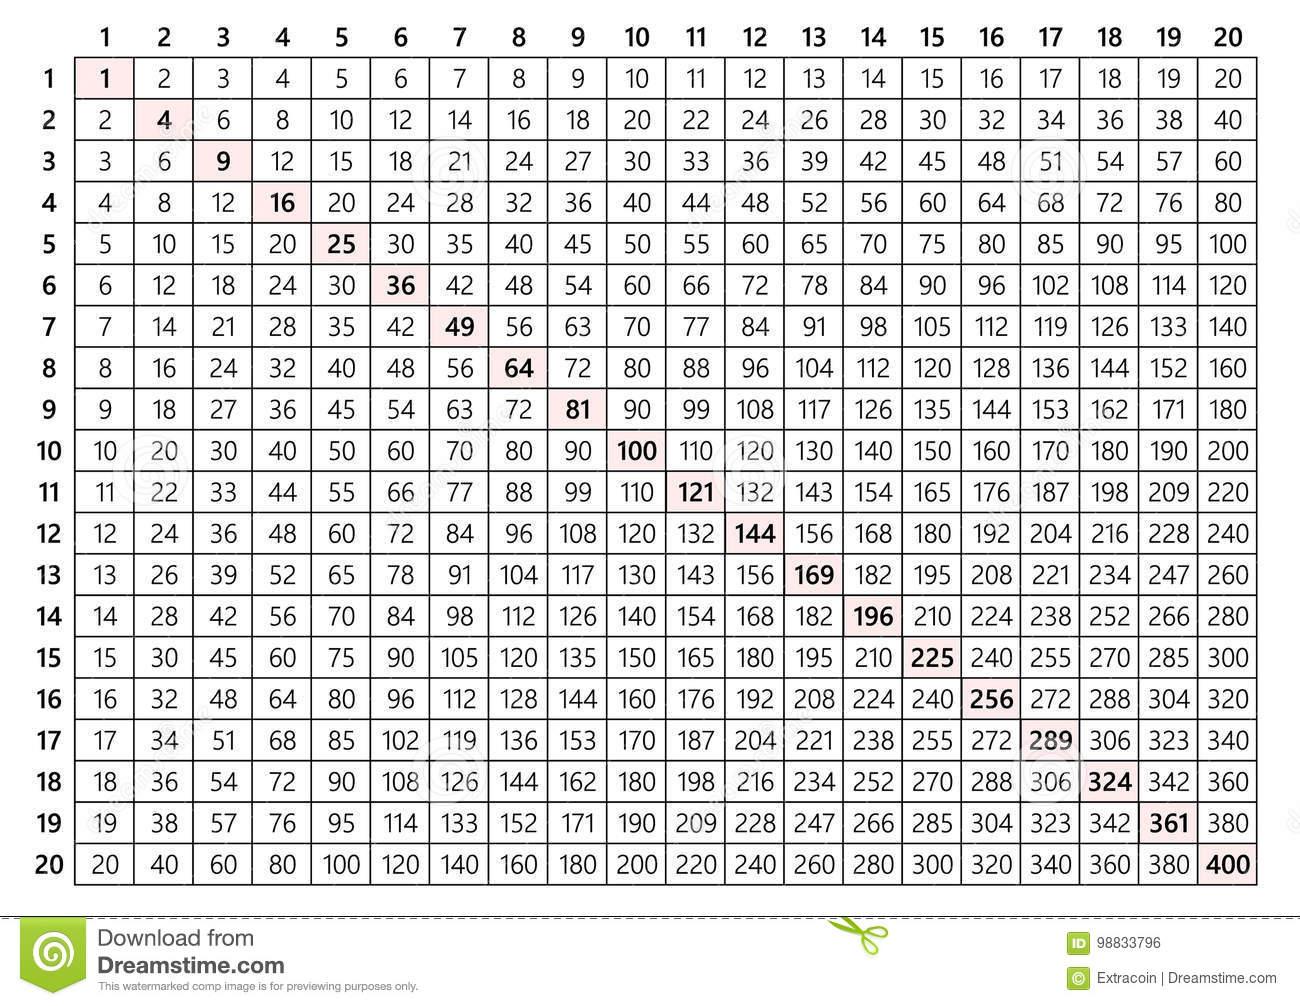 Multiplication Table 20X20 Stock Vector. Illustration Of